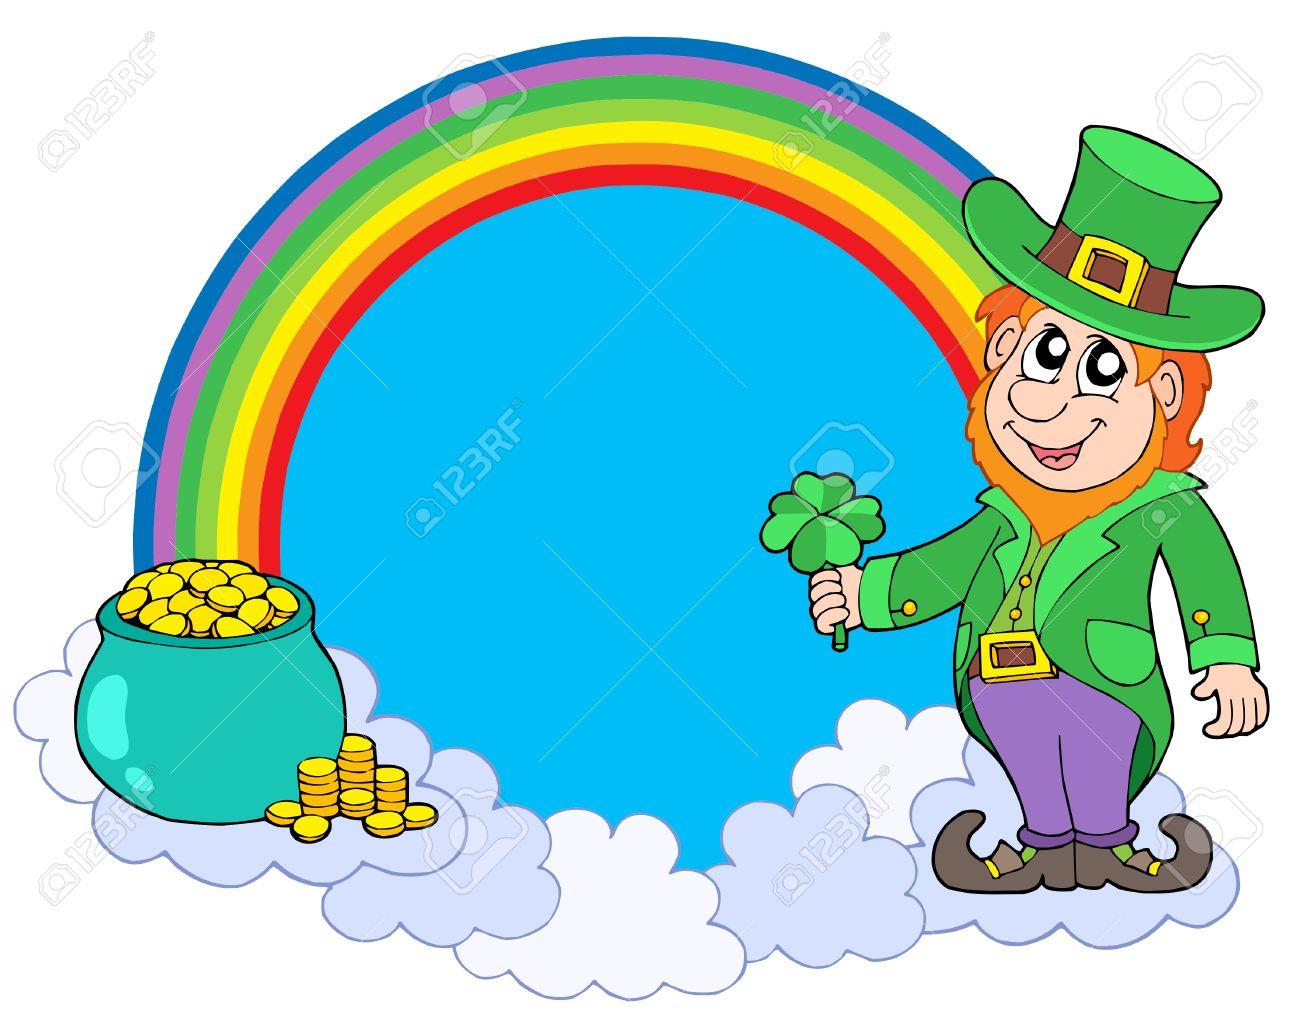 Uncategorized Leprechauns And Rainbows rainbow circle with leprechaun vector illustration royalty free stock 4182476